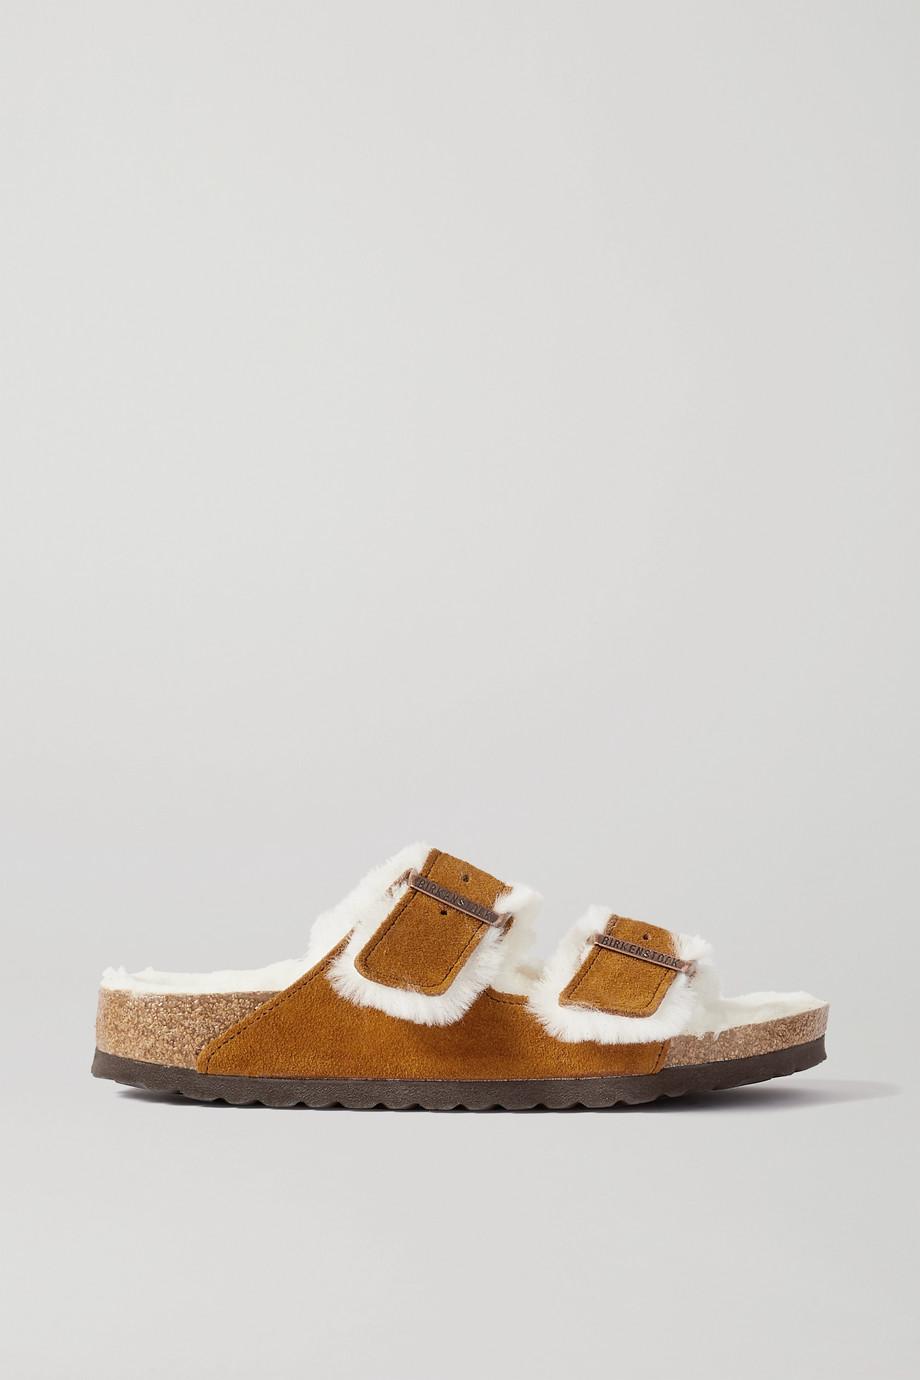 Birkenstock Arizona shearling-lined suede sandals